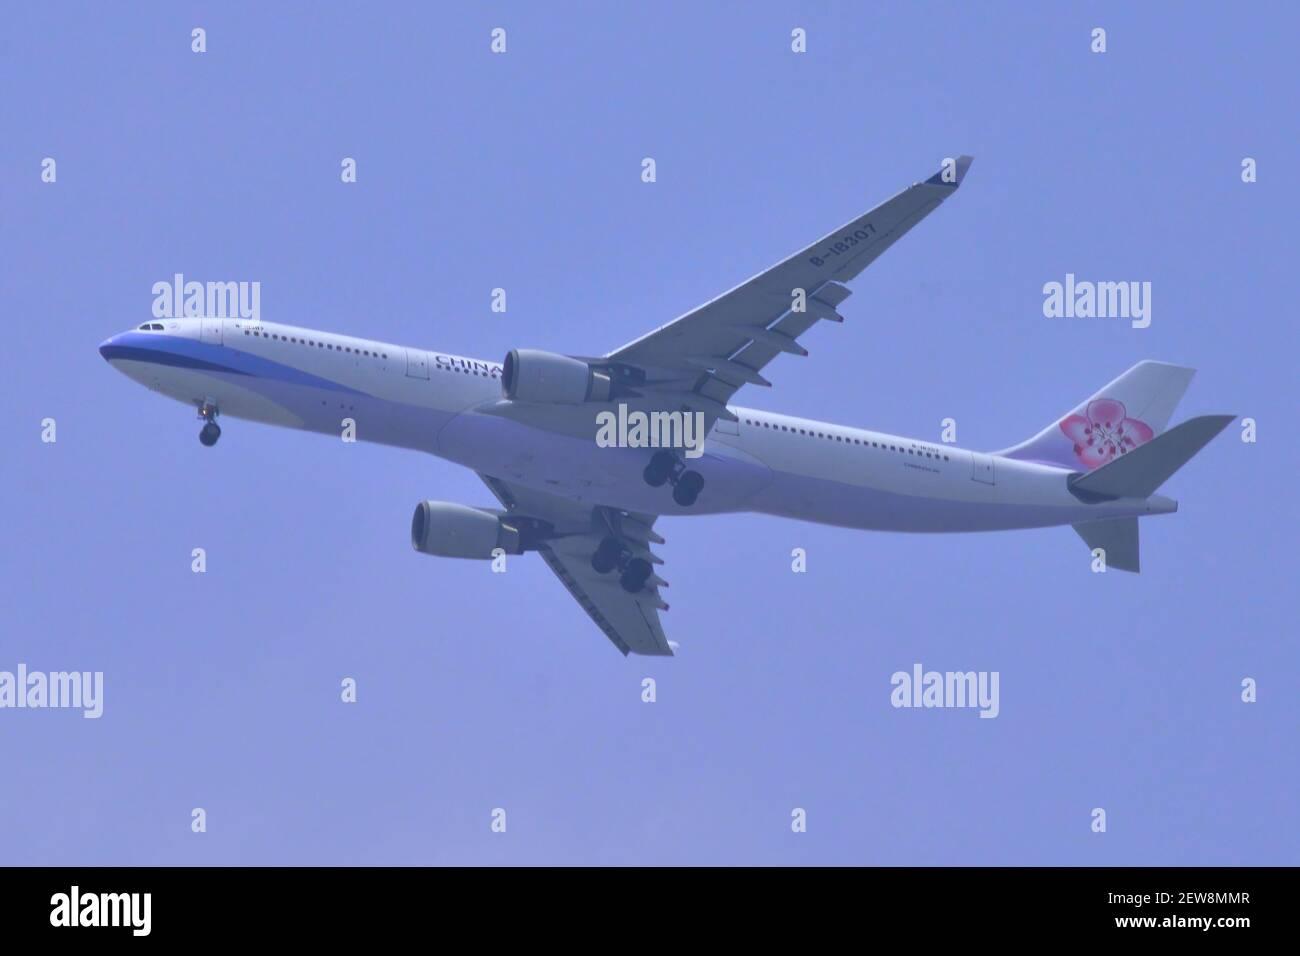 TChina Airlines, Taiwan, Airbus, A330-300, B-18307, Final approach, Landing, Tokyo Haneda Airport, Tokyo, Japan, imp Stock Photo